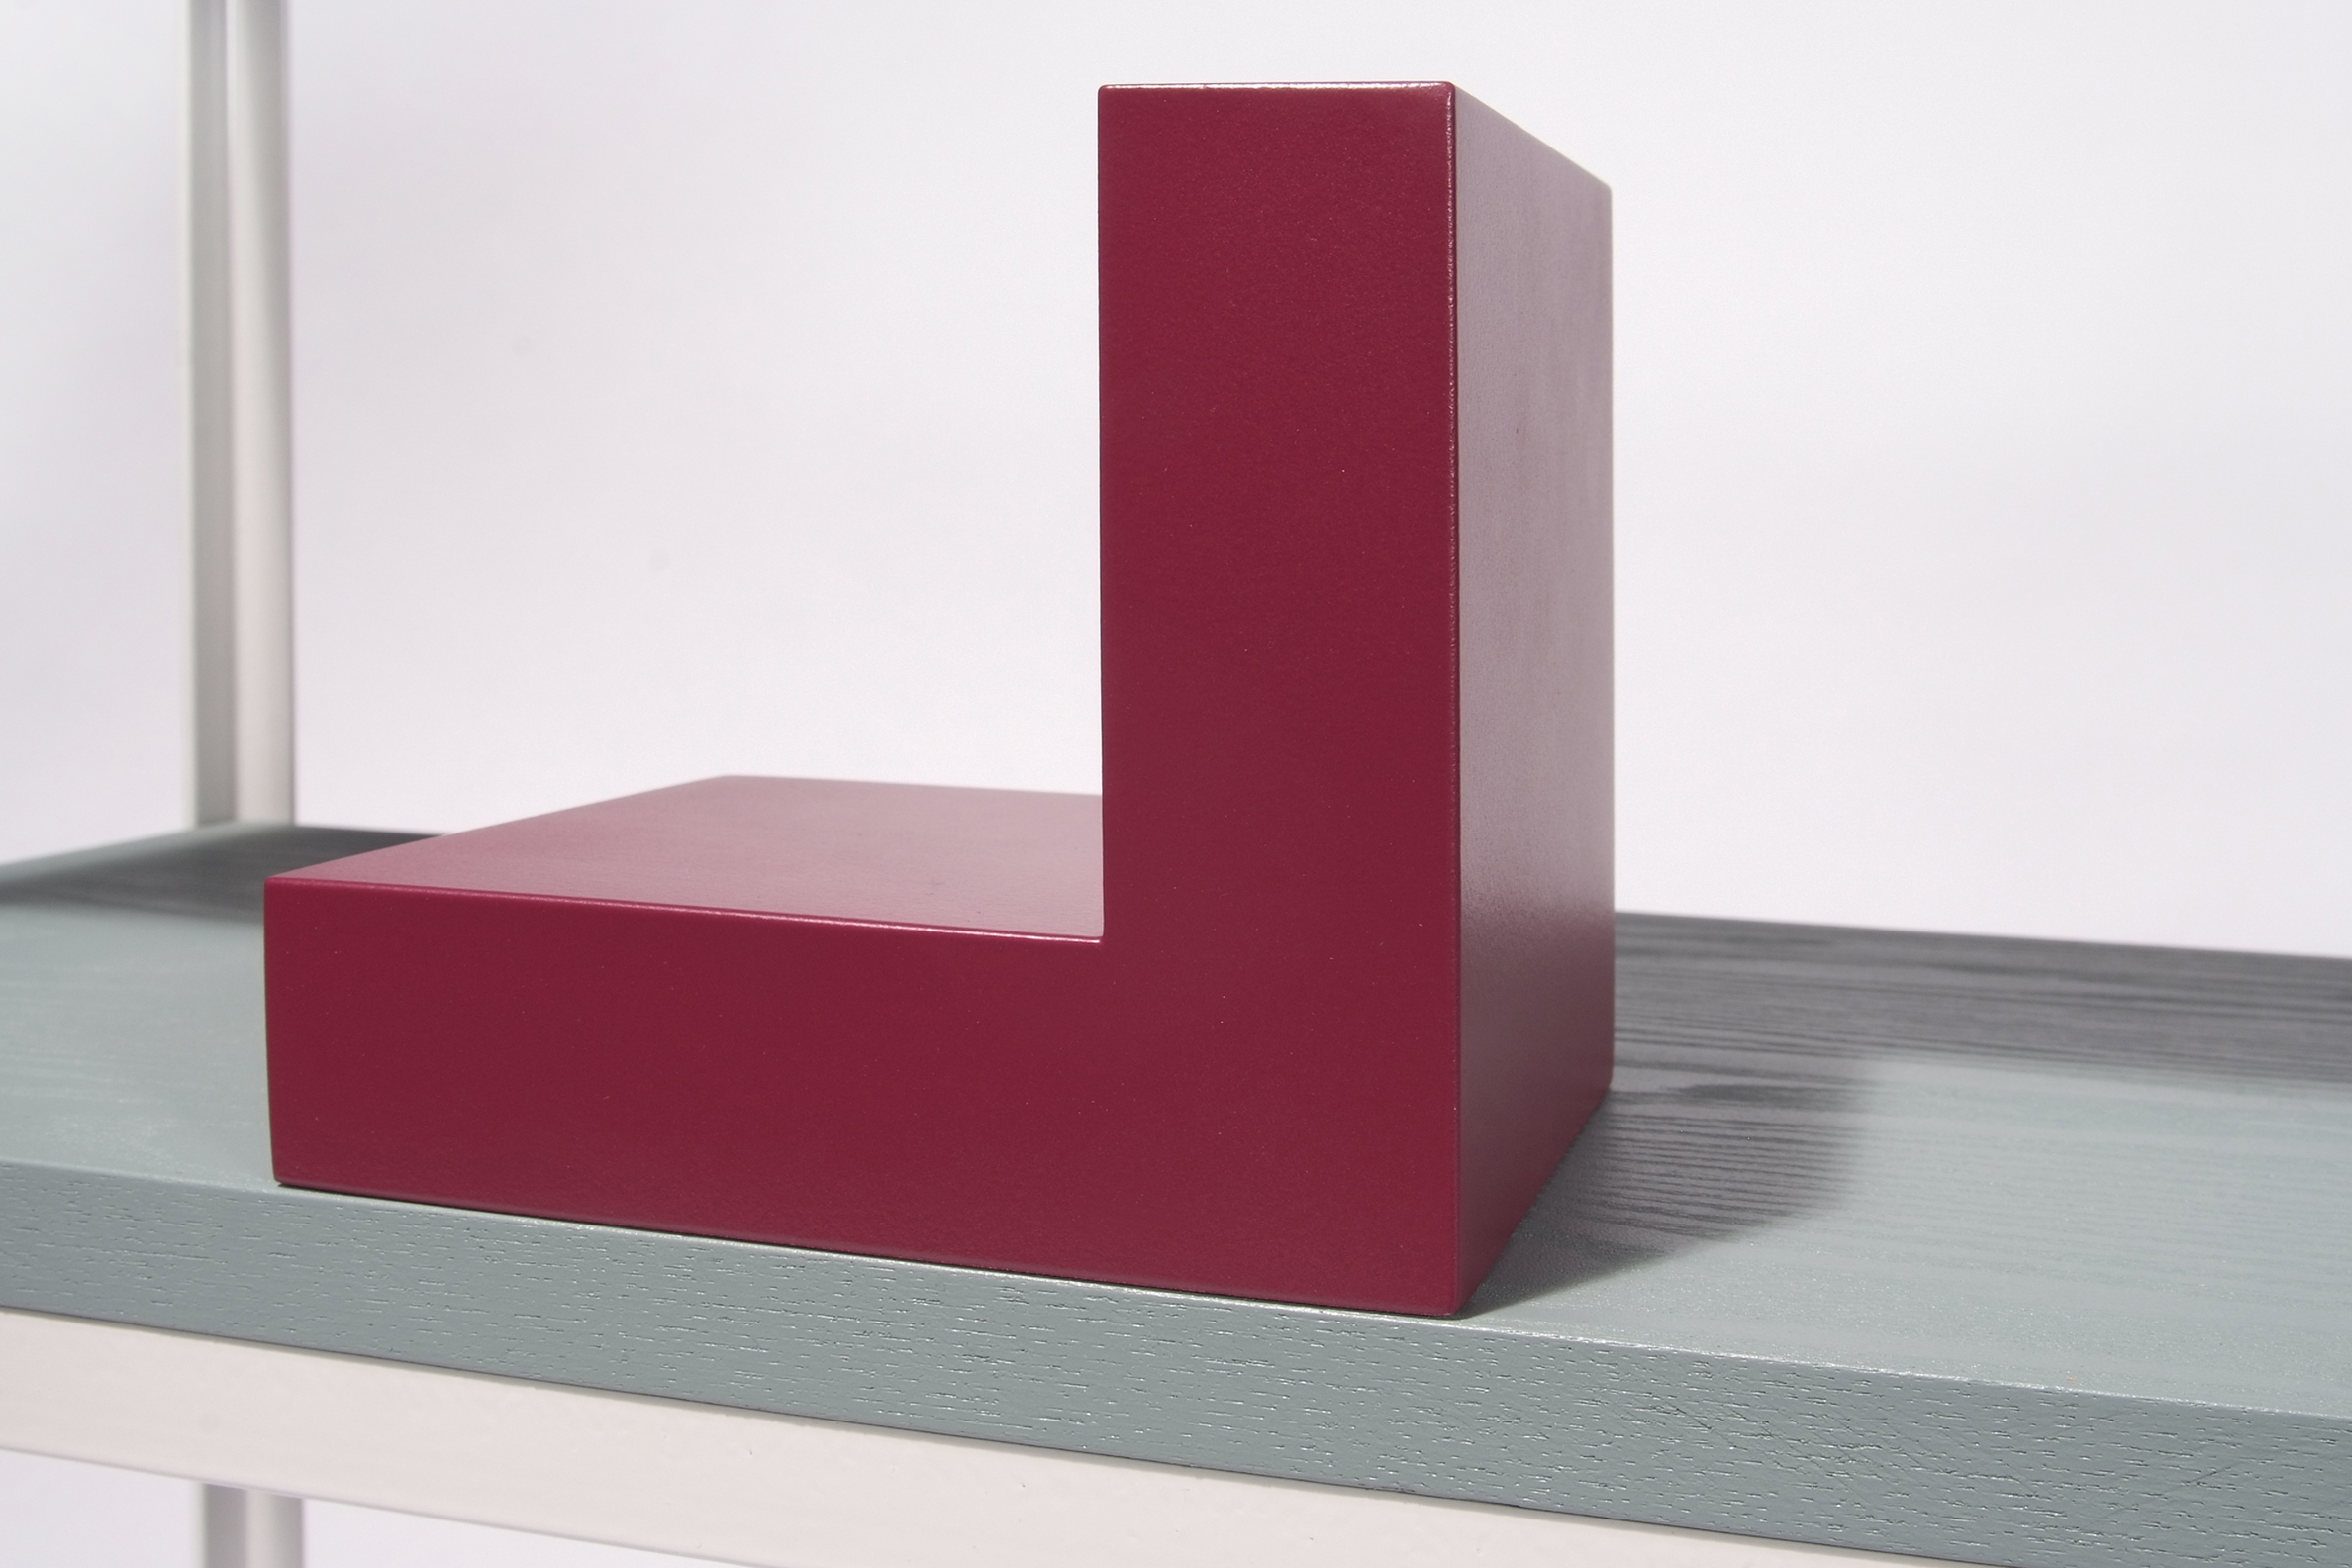 tablescapeI-06-zoemowat.jpg